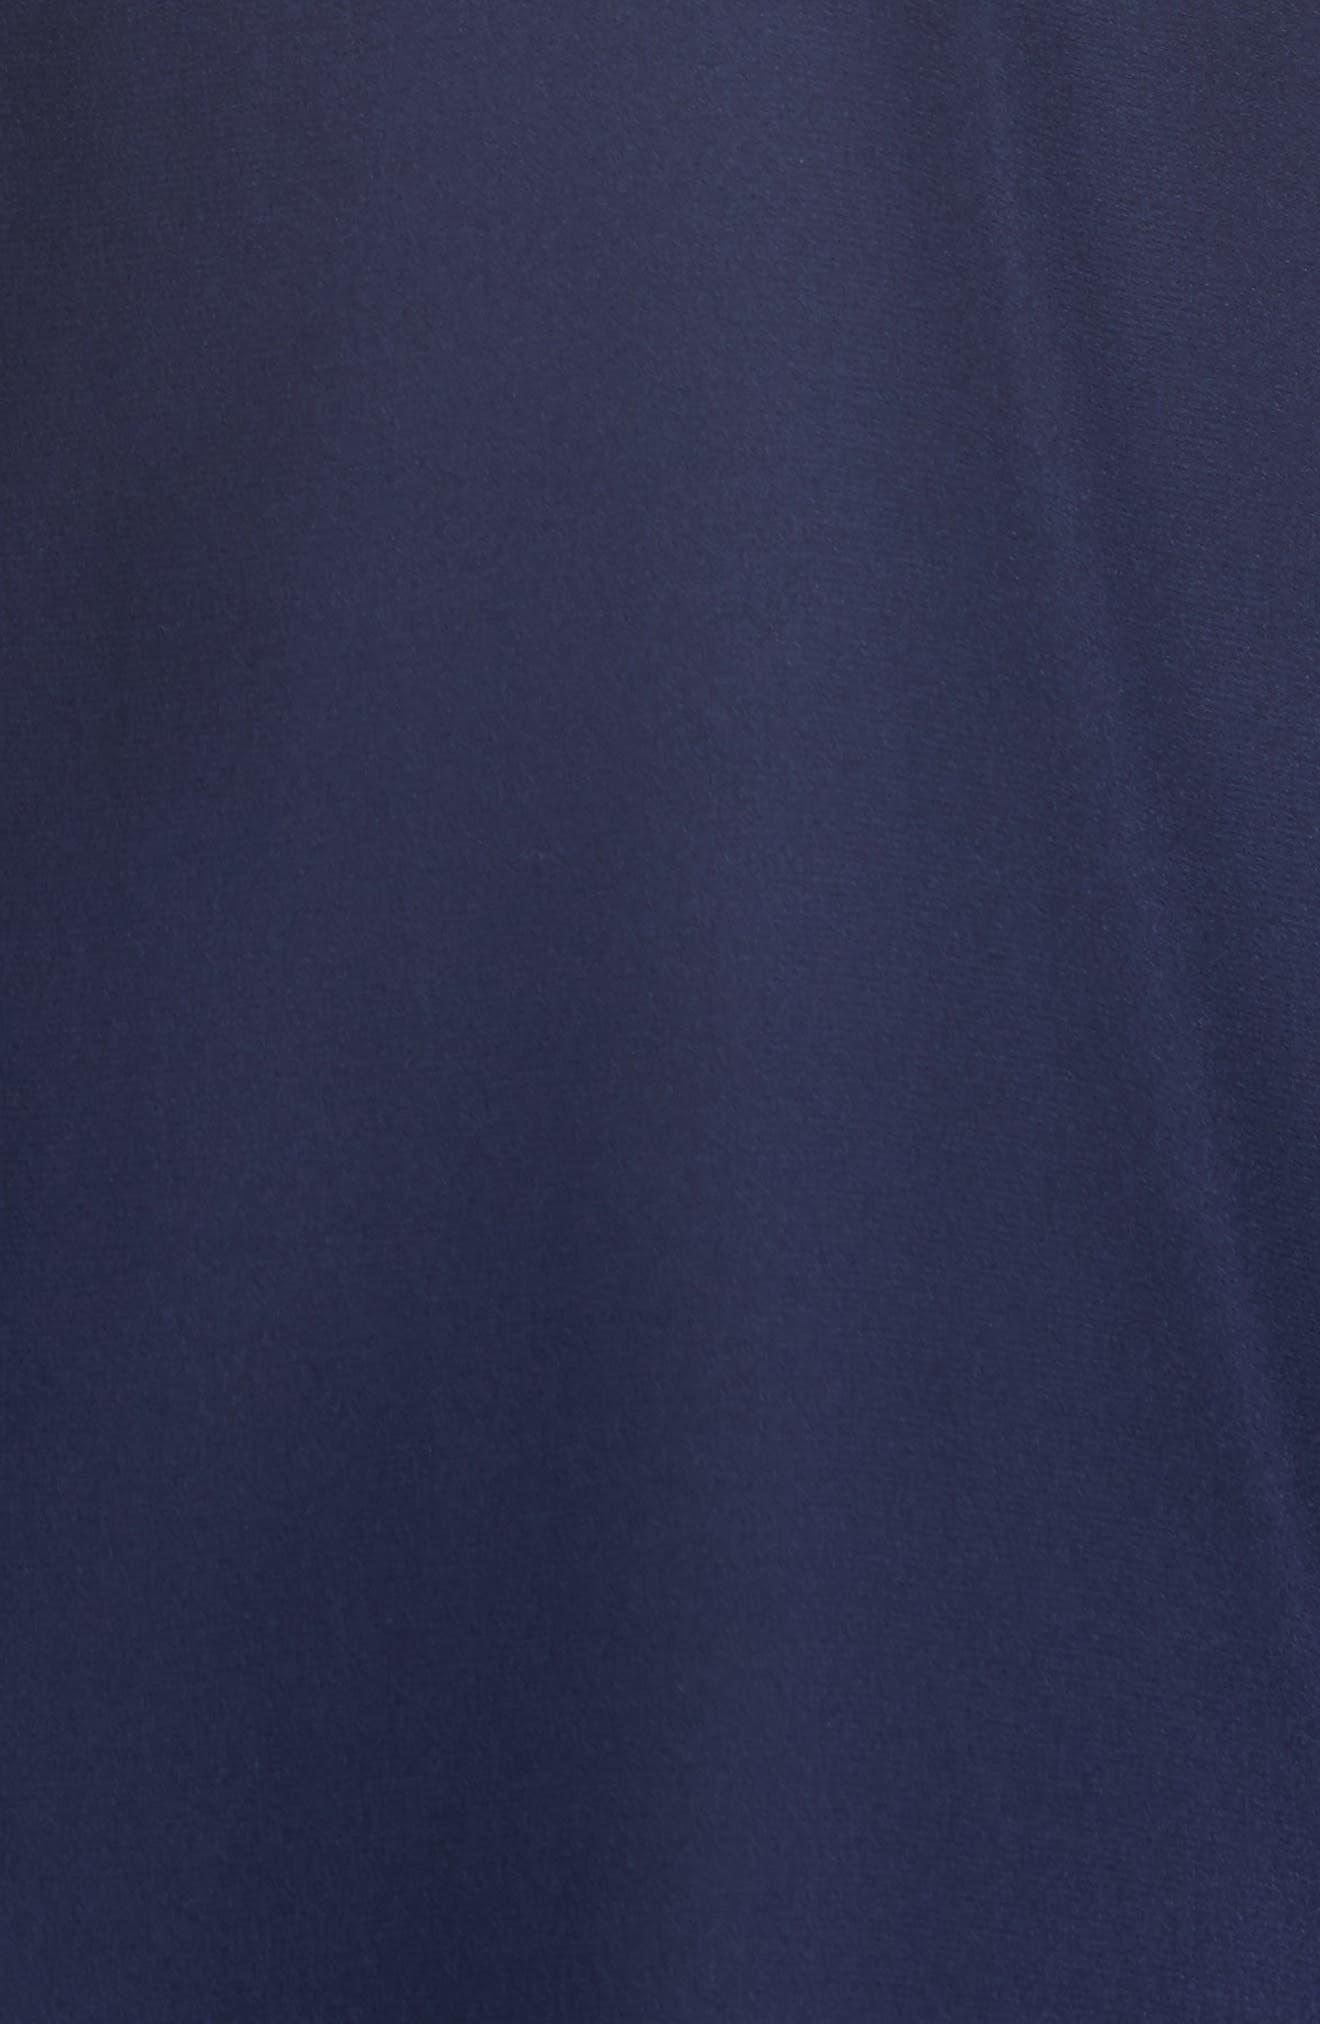 Daryn Matte Silk & Knit Combo Blouse,                             Alternate thumbnail 18, color,